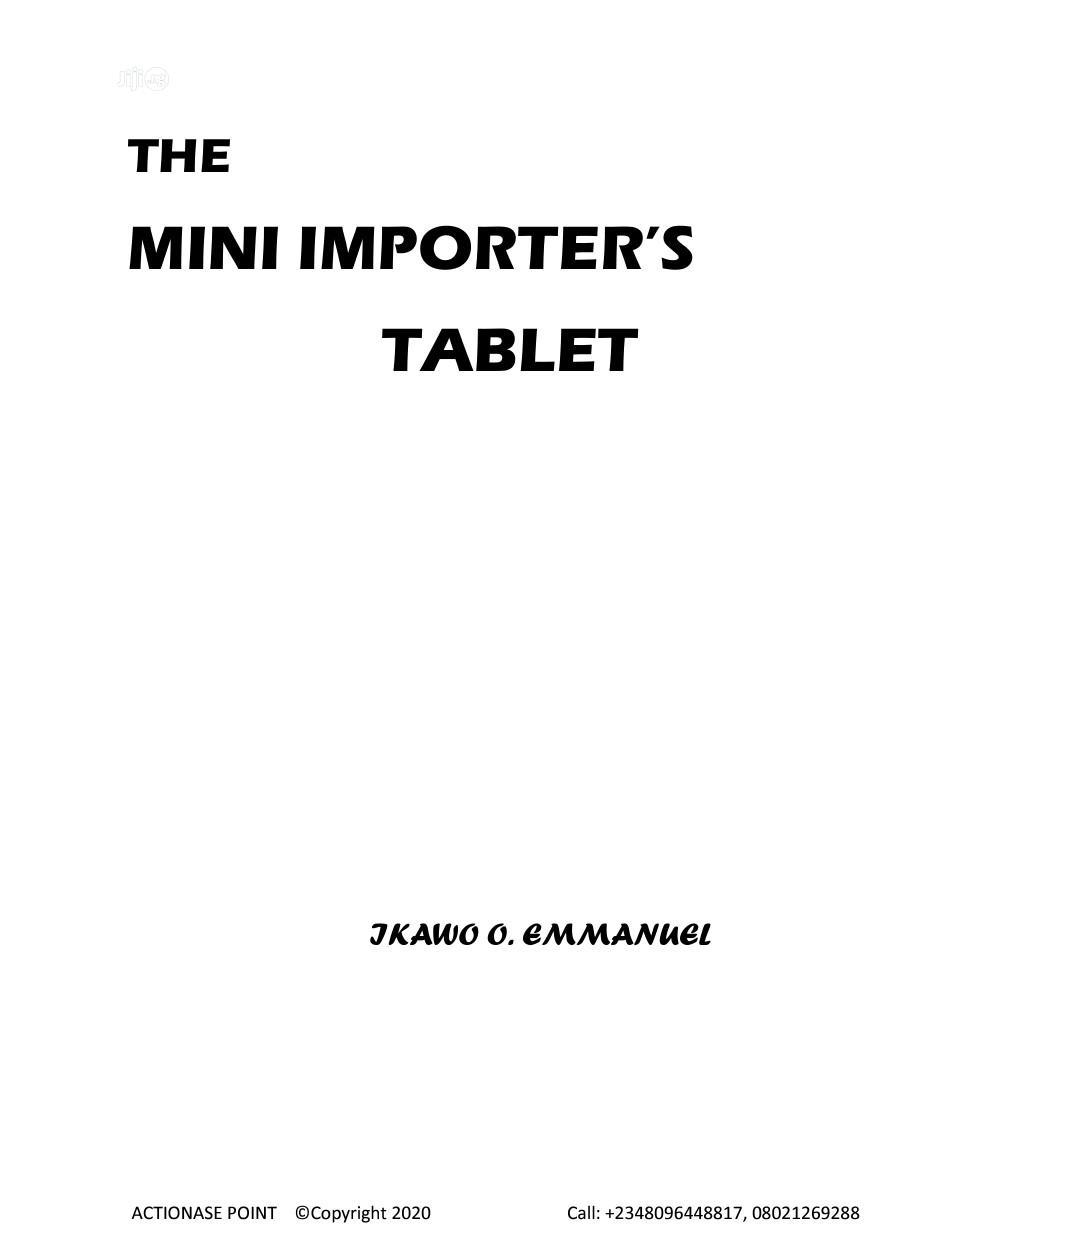 The Mini Importer's Tablet